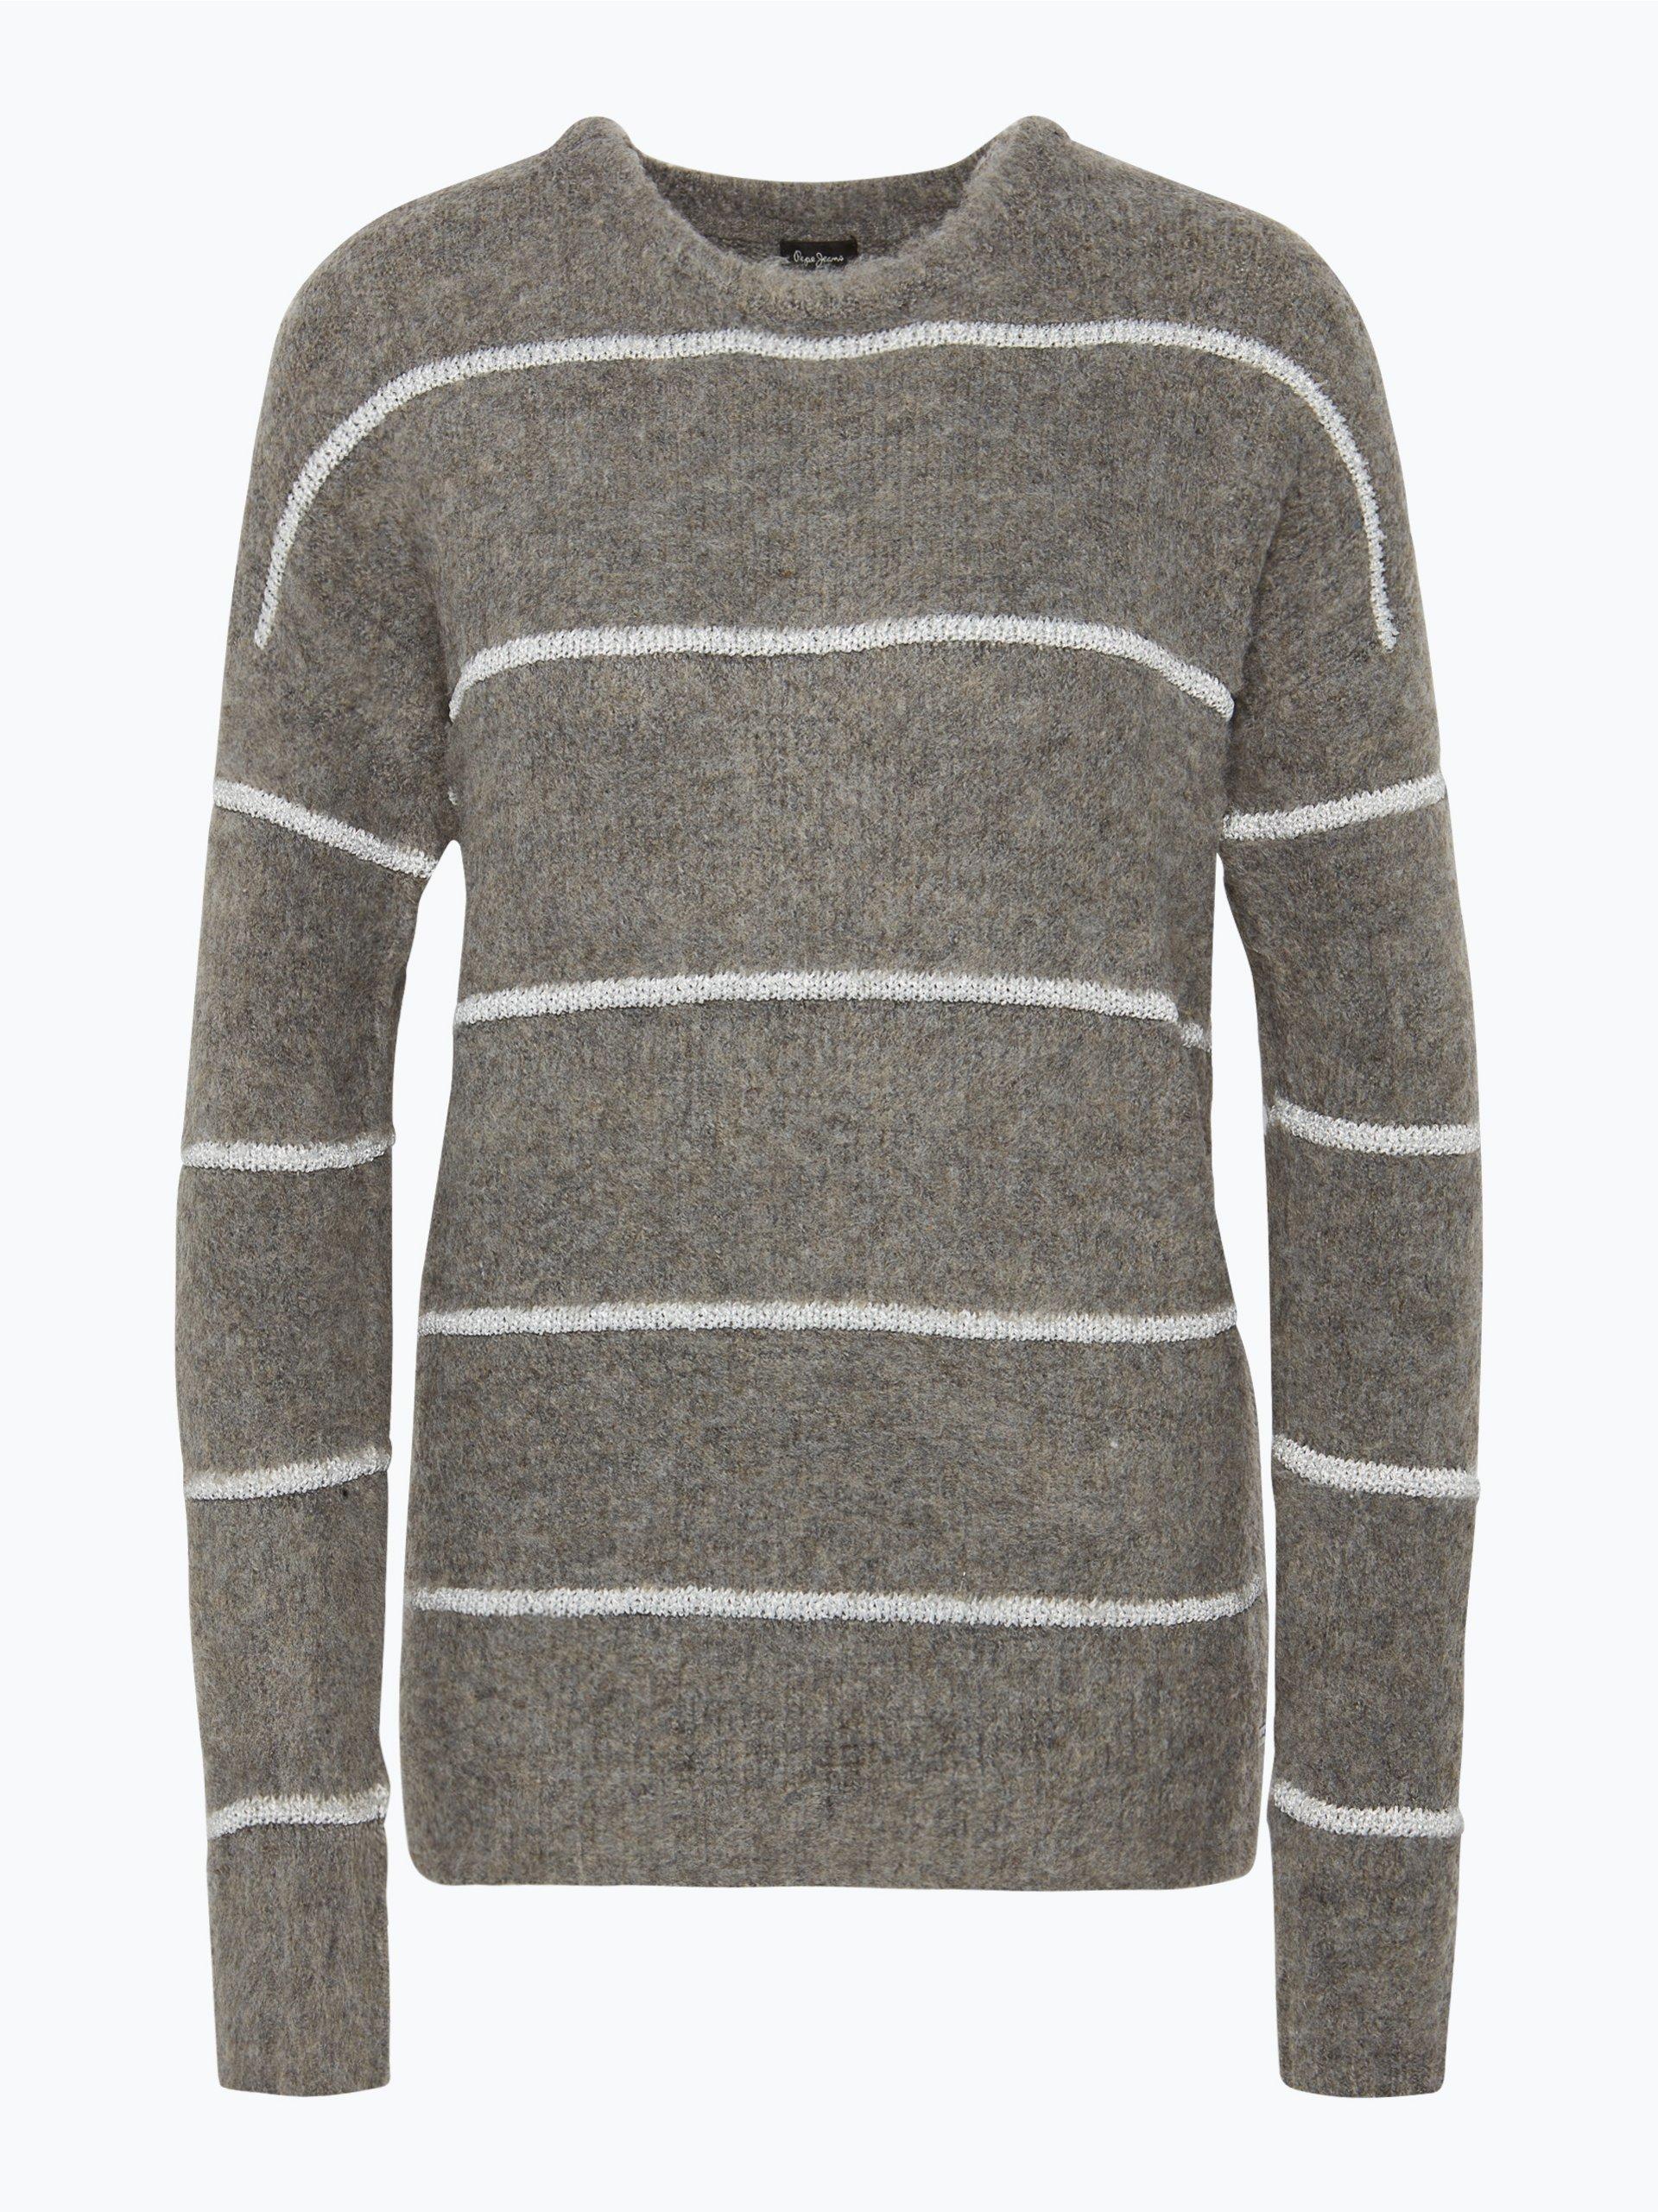 pepe jeans damen pullover grau uni online kaufen. Black Bedroom Furniture Sets. Home Design Ideas